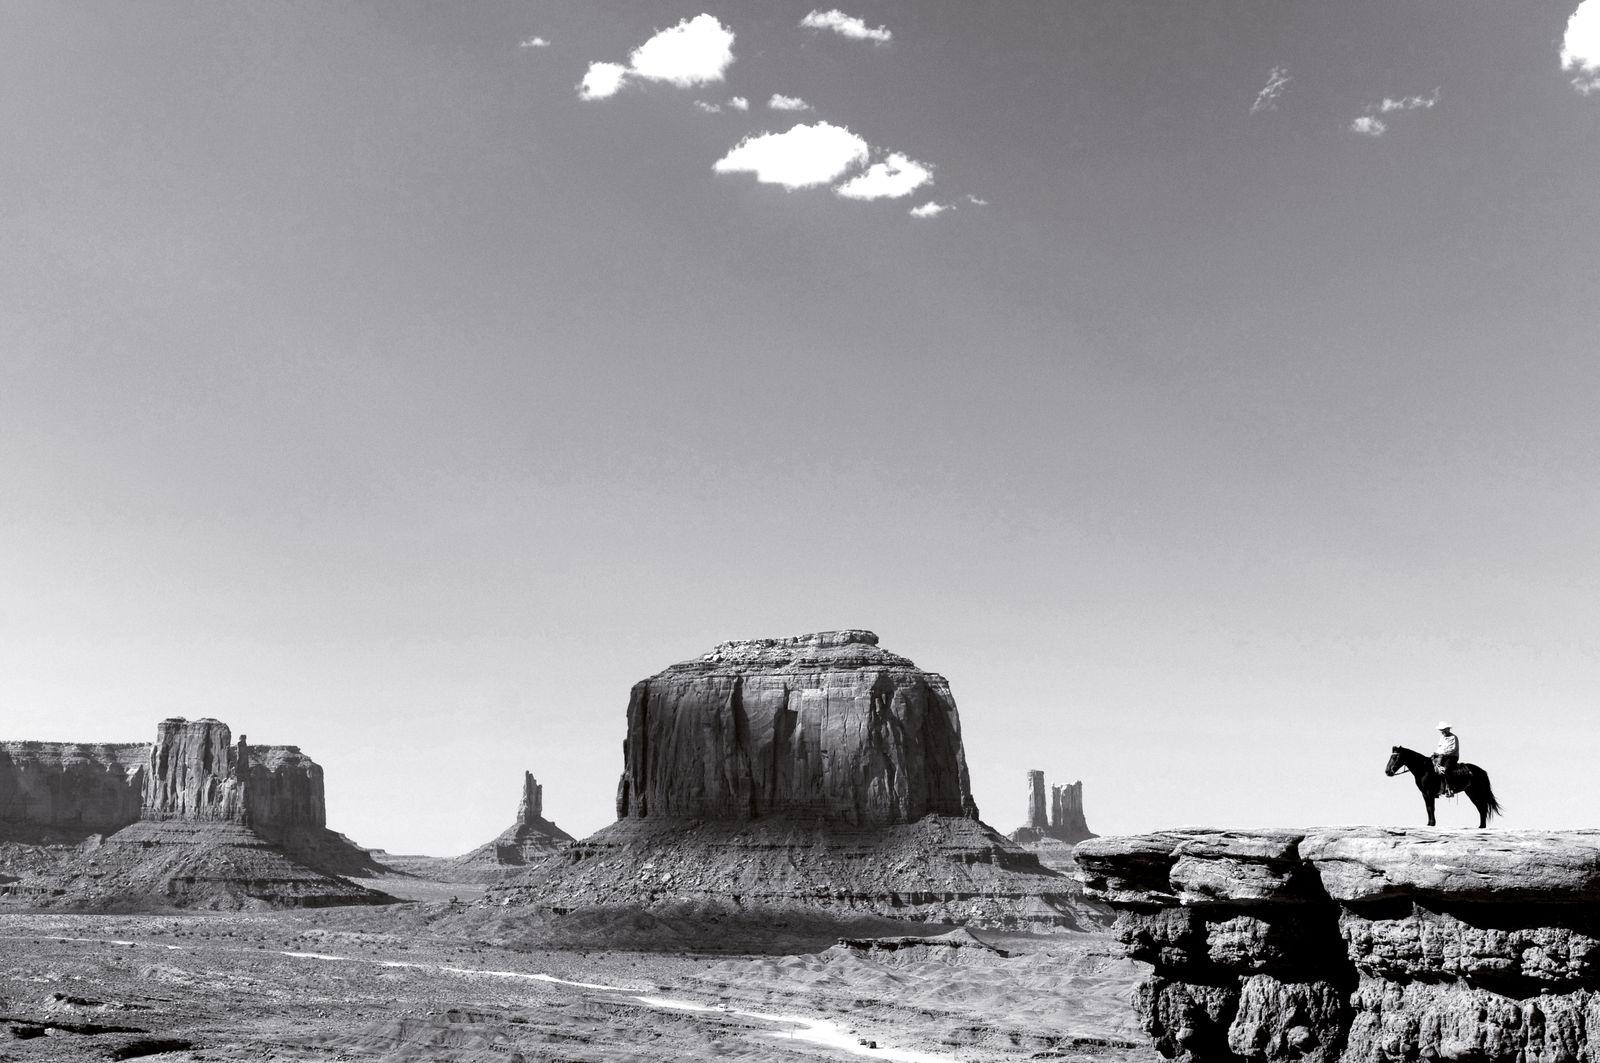 A Navaho man on horseback.